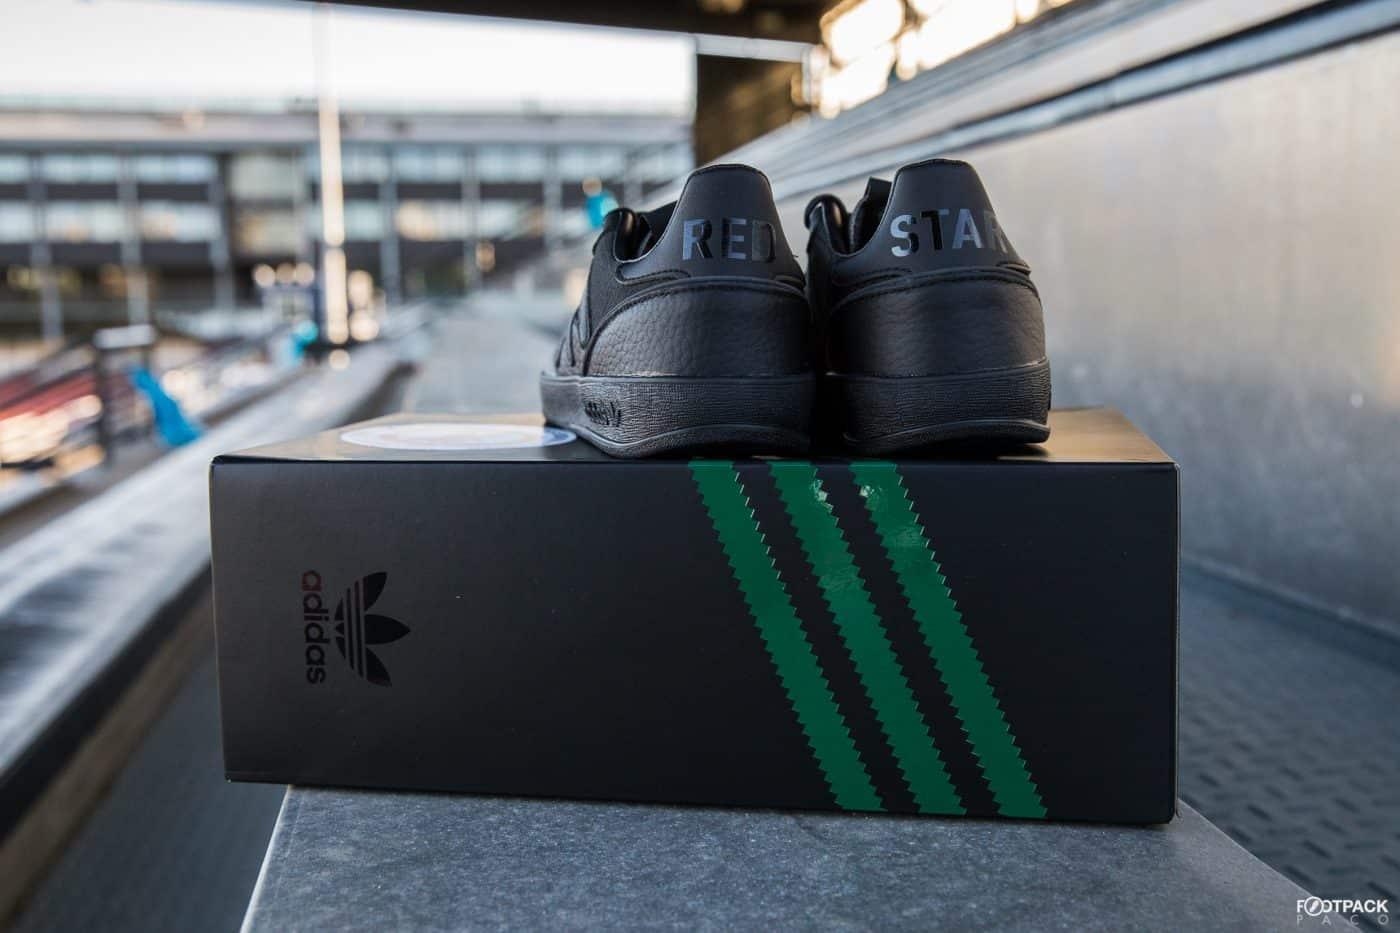 adidas-sobakov-red-star-footpack-5